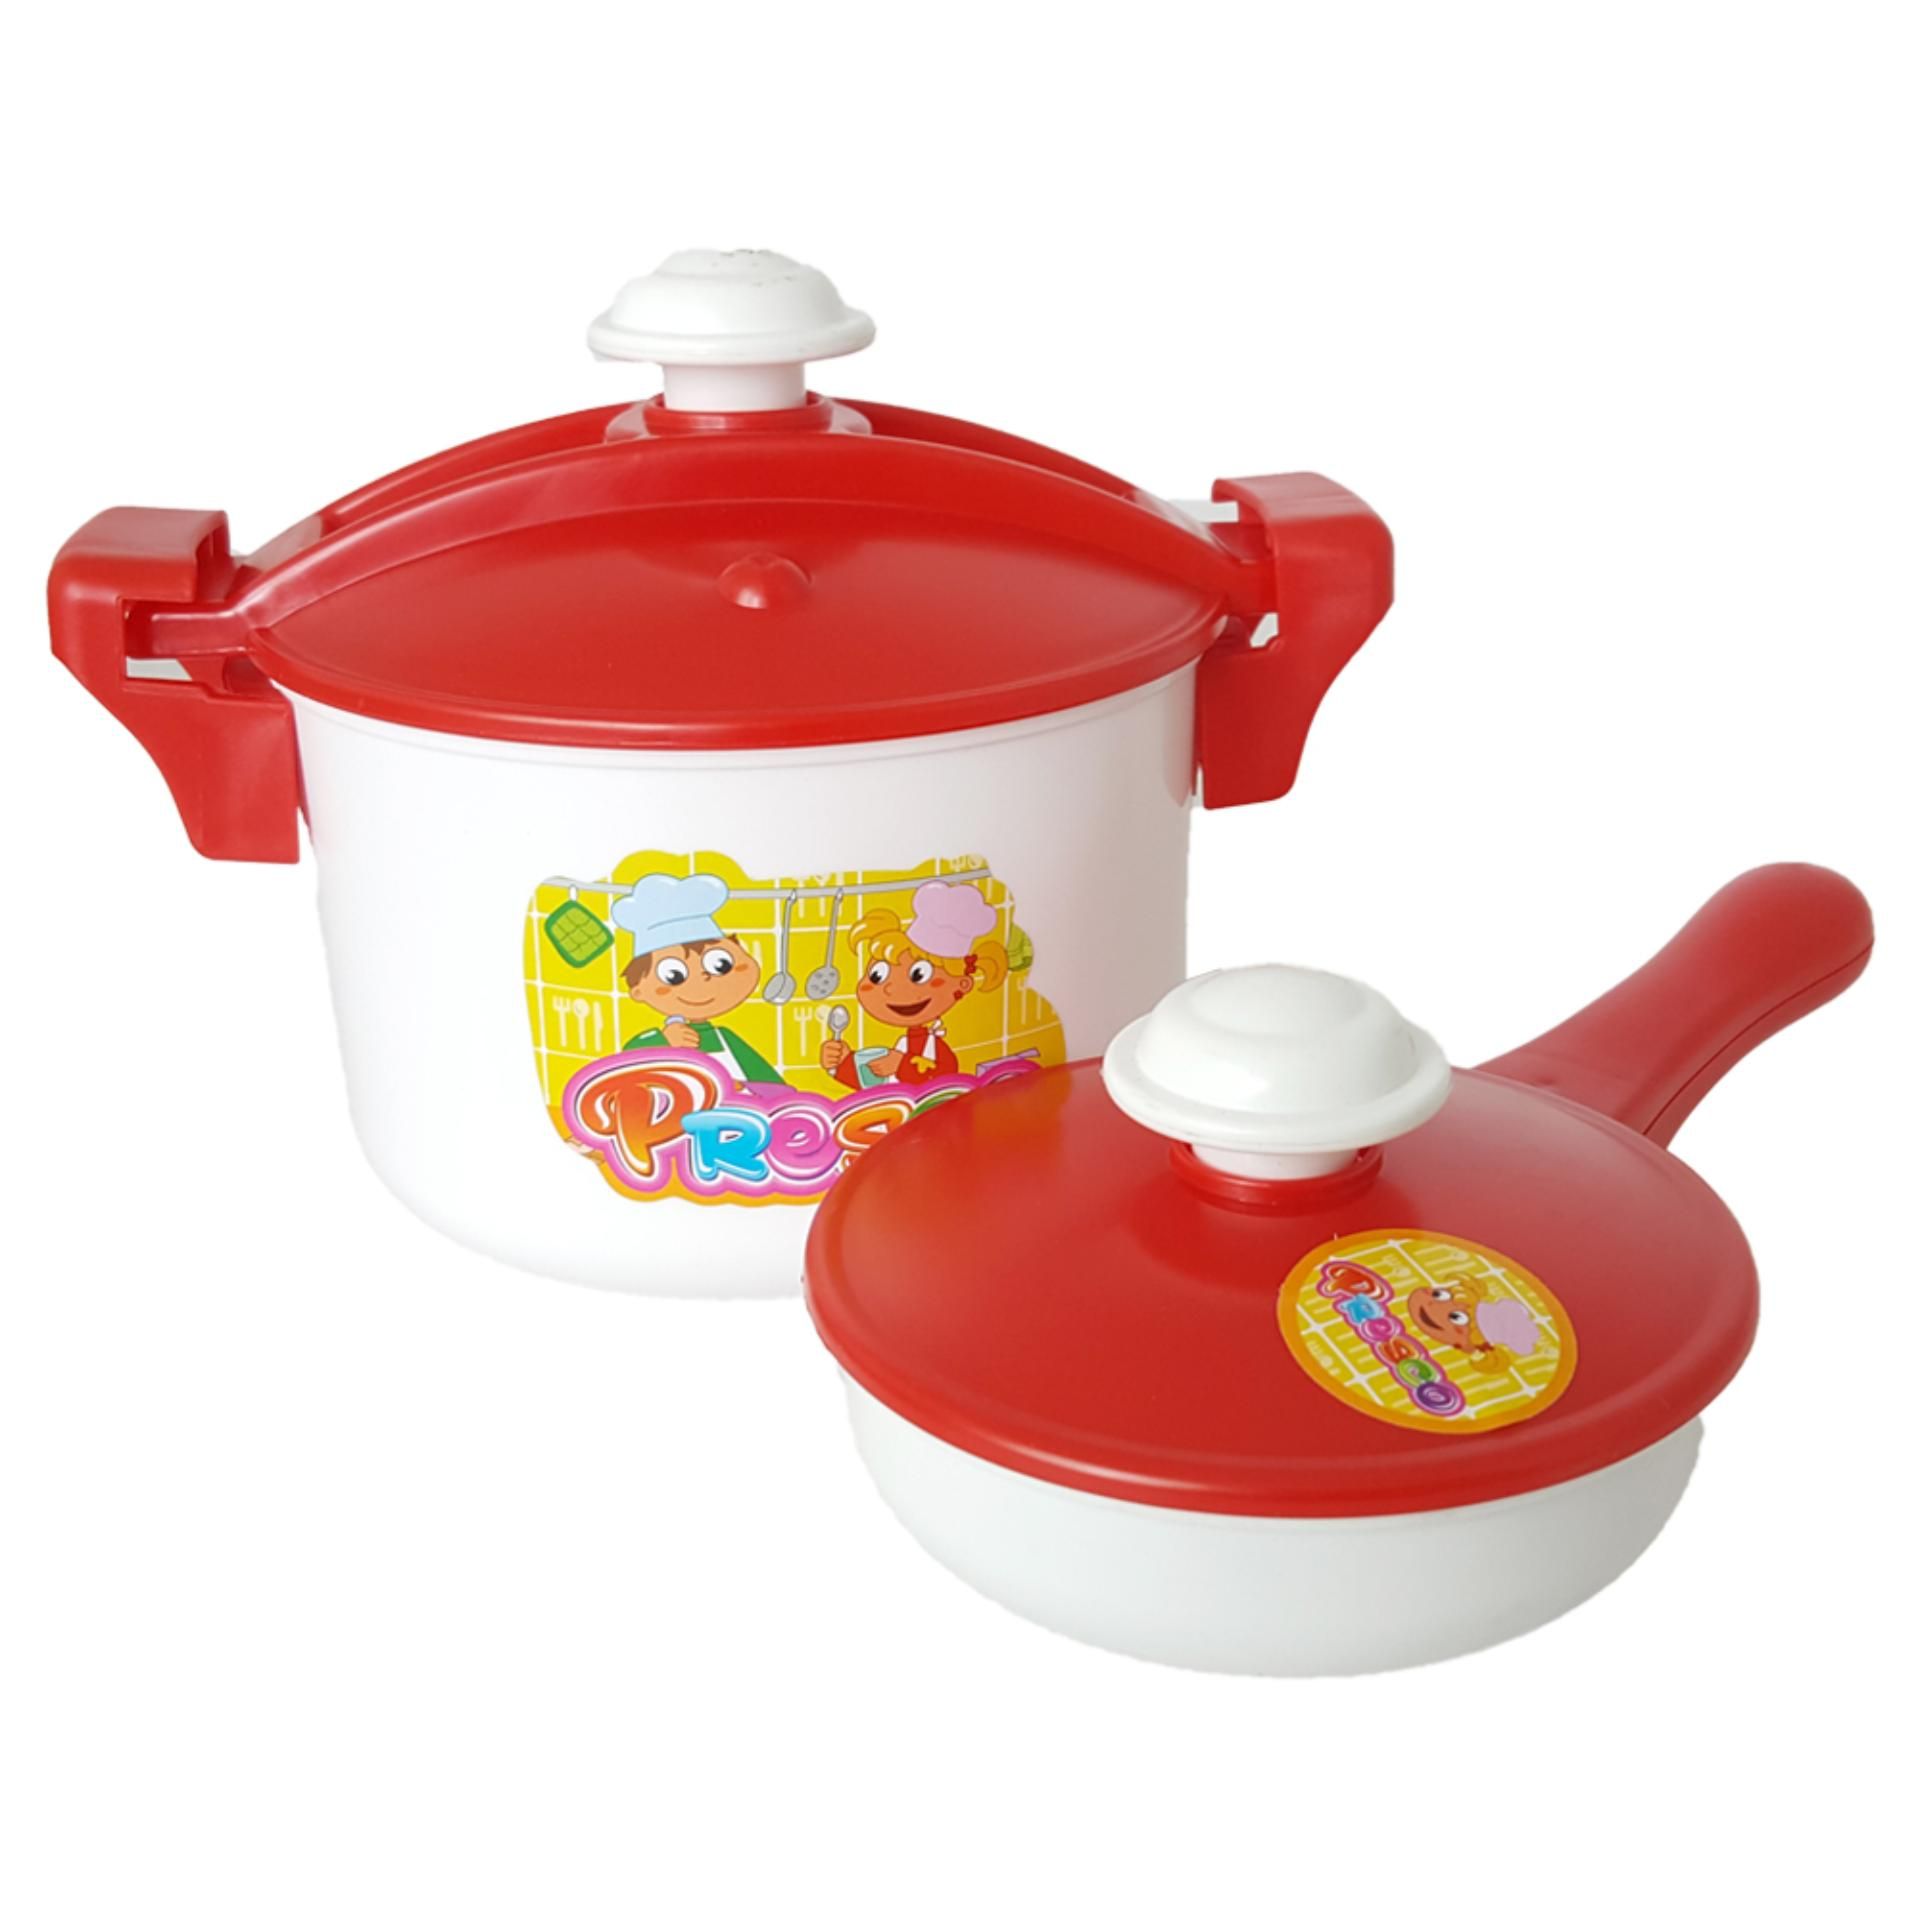 BB Mart Mainan Dapur Idaman Set 2 Pcs Merah - Mainan Masak Masakan .